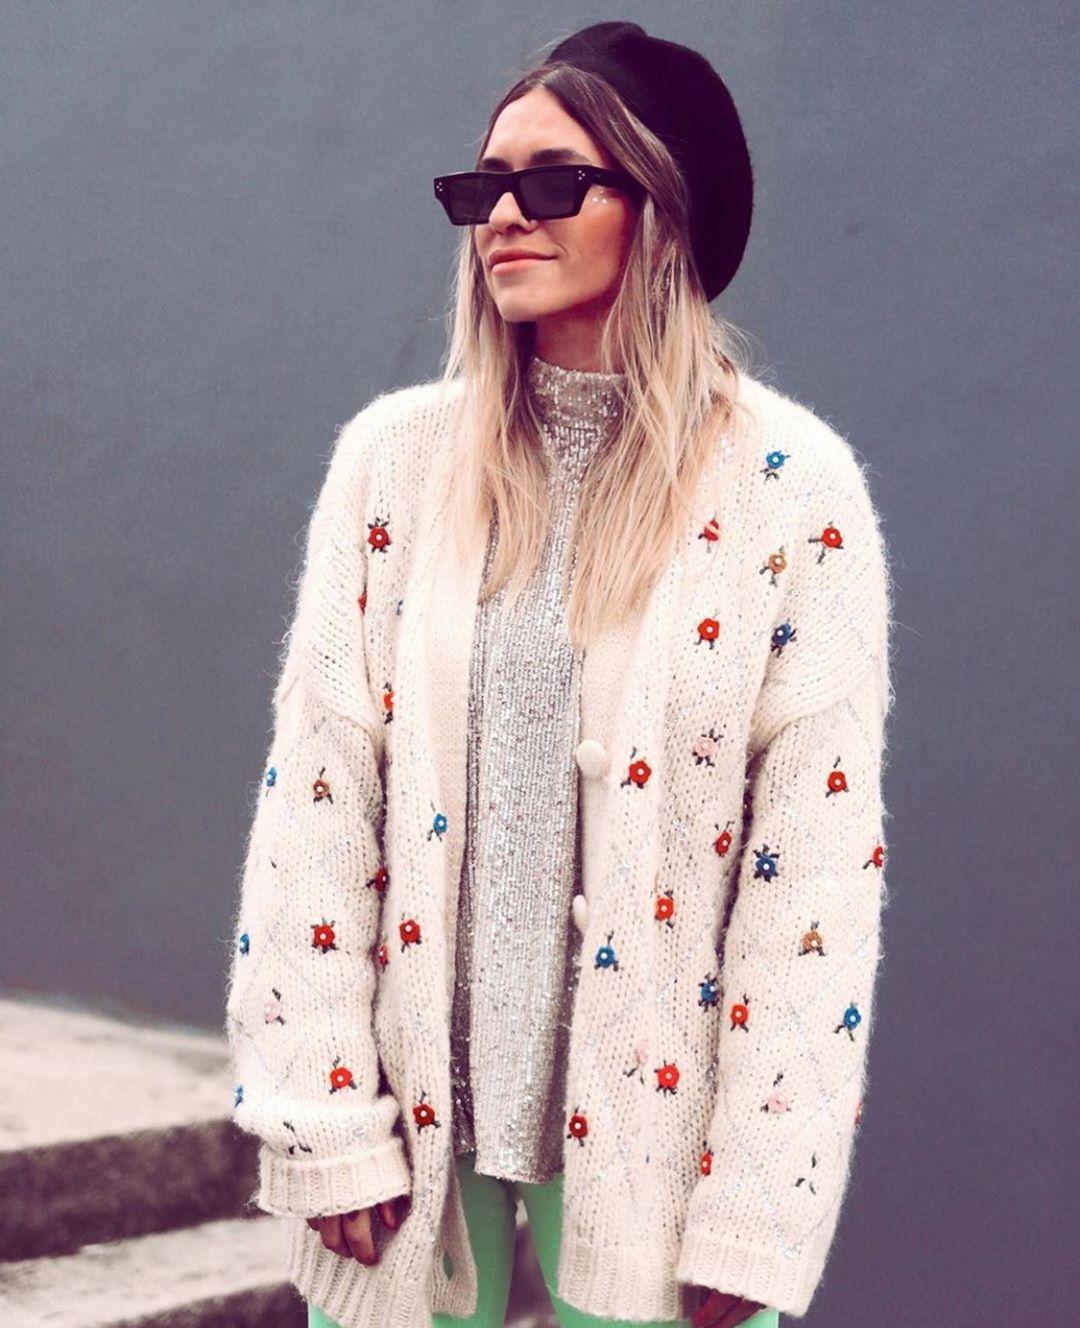 gilet brodé édition limitée de Zara sur zara.outfits